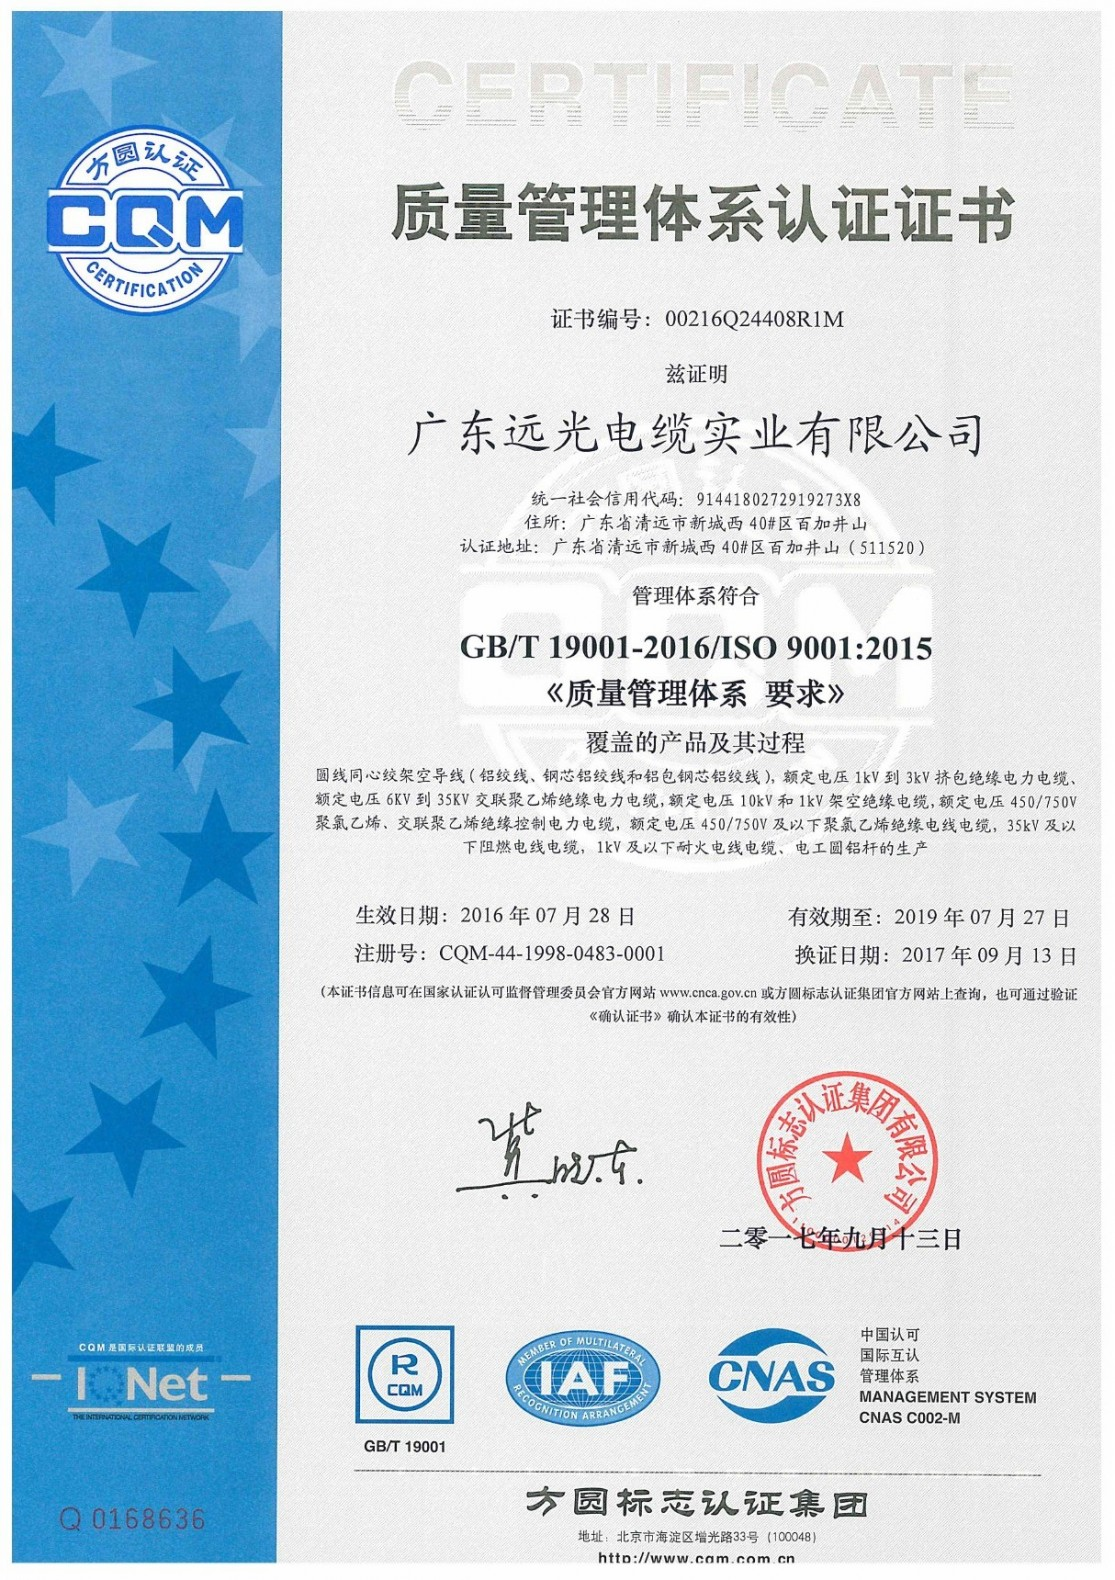 ISO9001质量管理体系认证证书-2008标准要求(中)